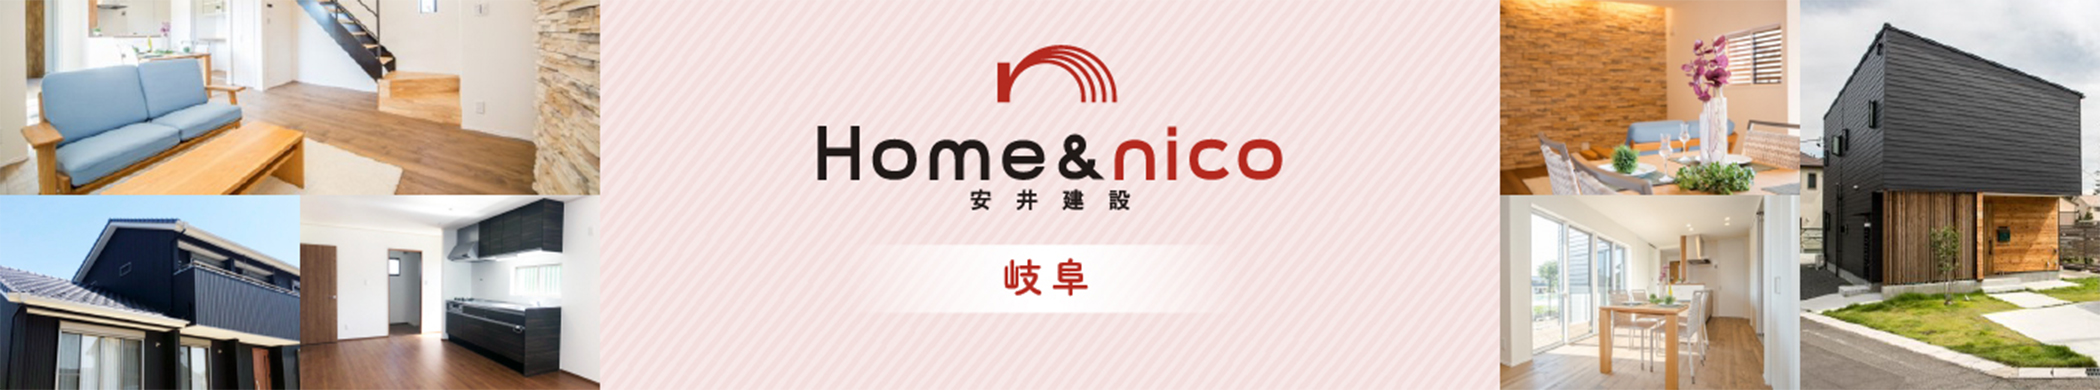 Home&nico 安井建設 -岐阜-